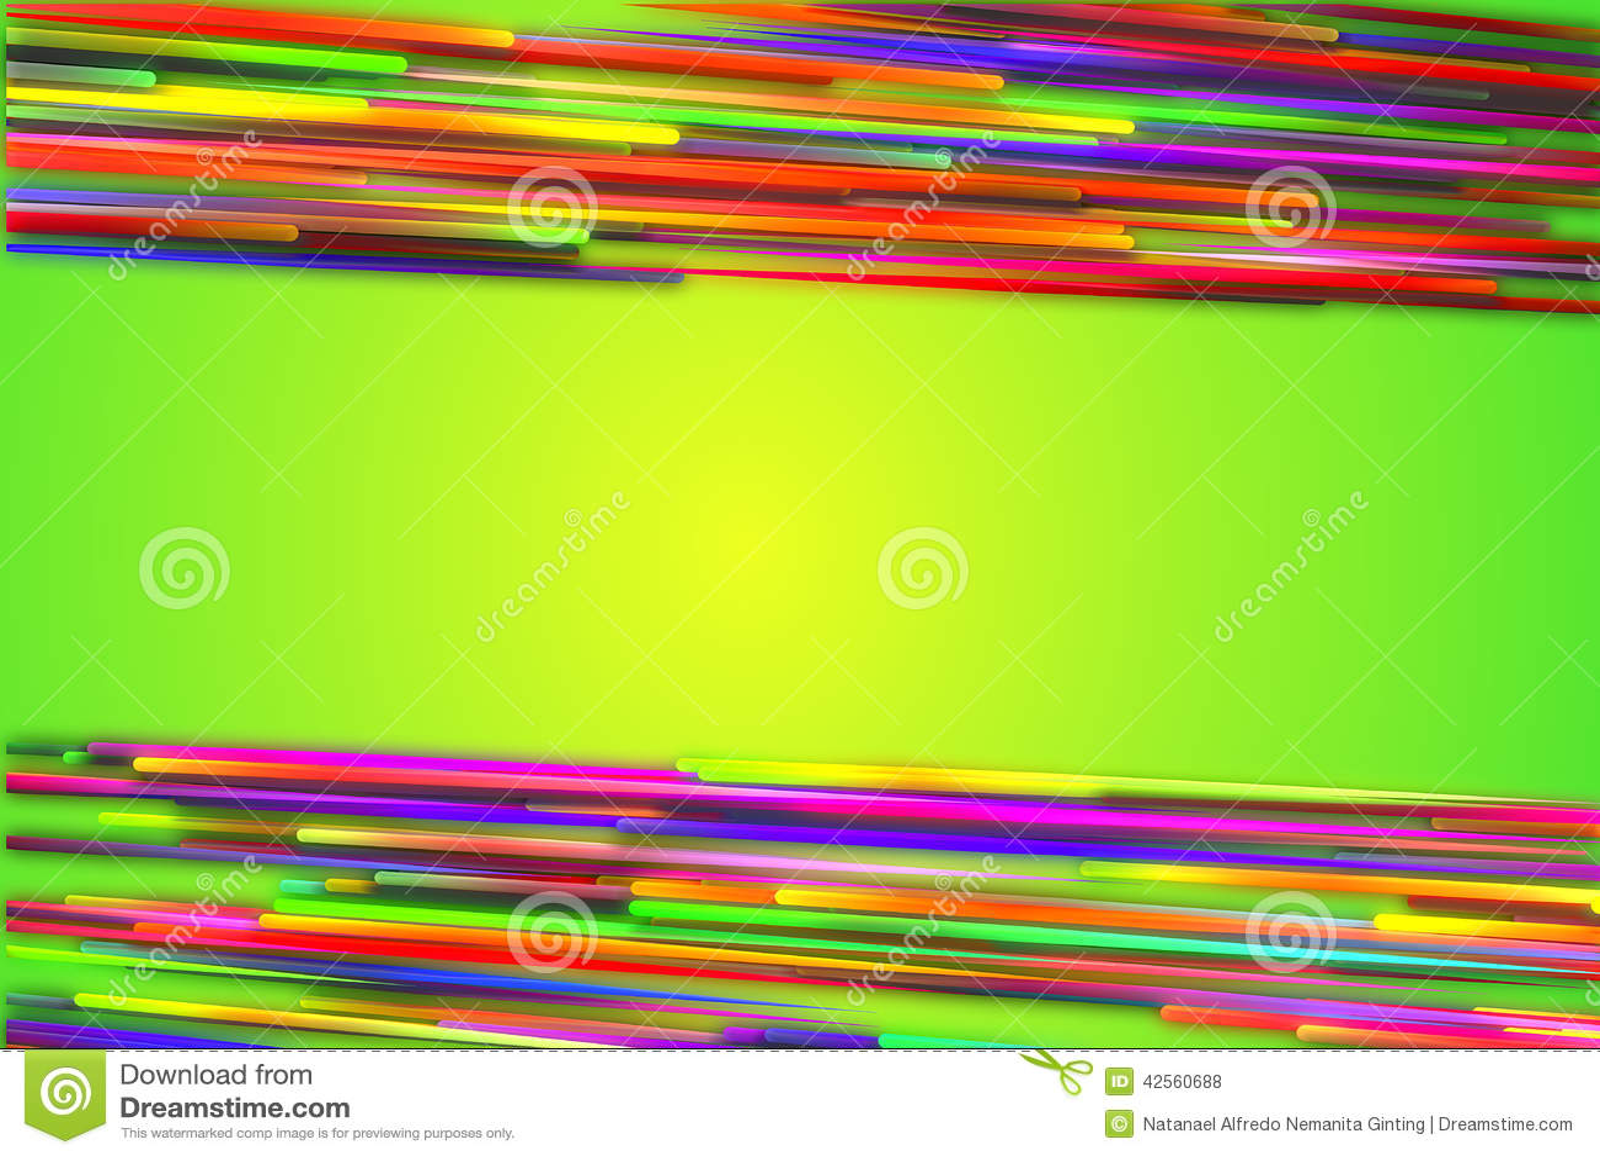 Horizontal Top Bottom Rainbow straight Line Glow Green Background